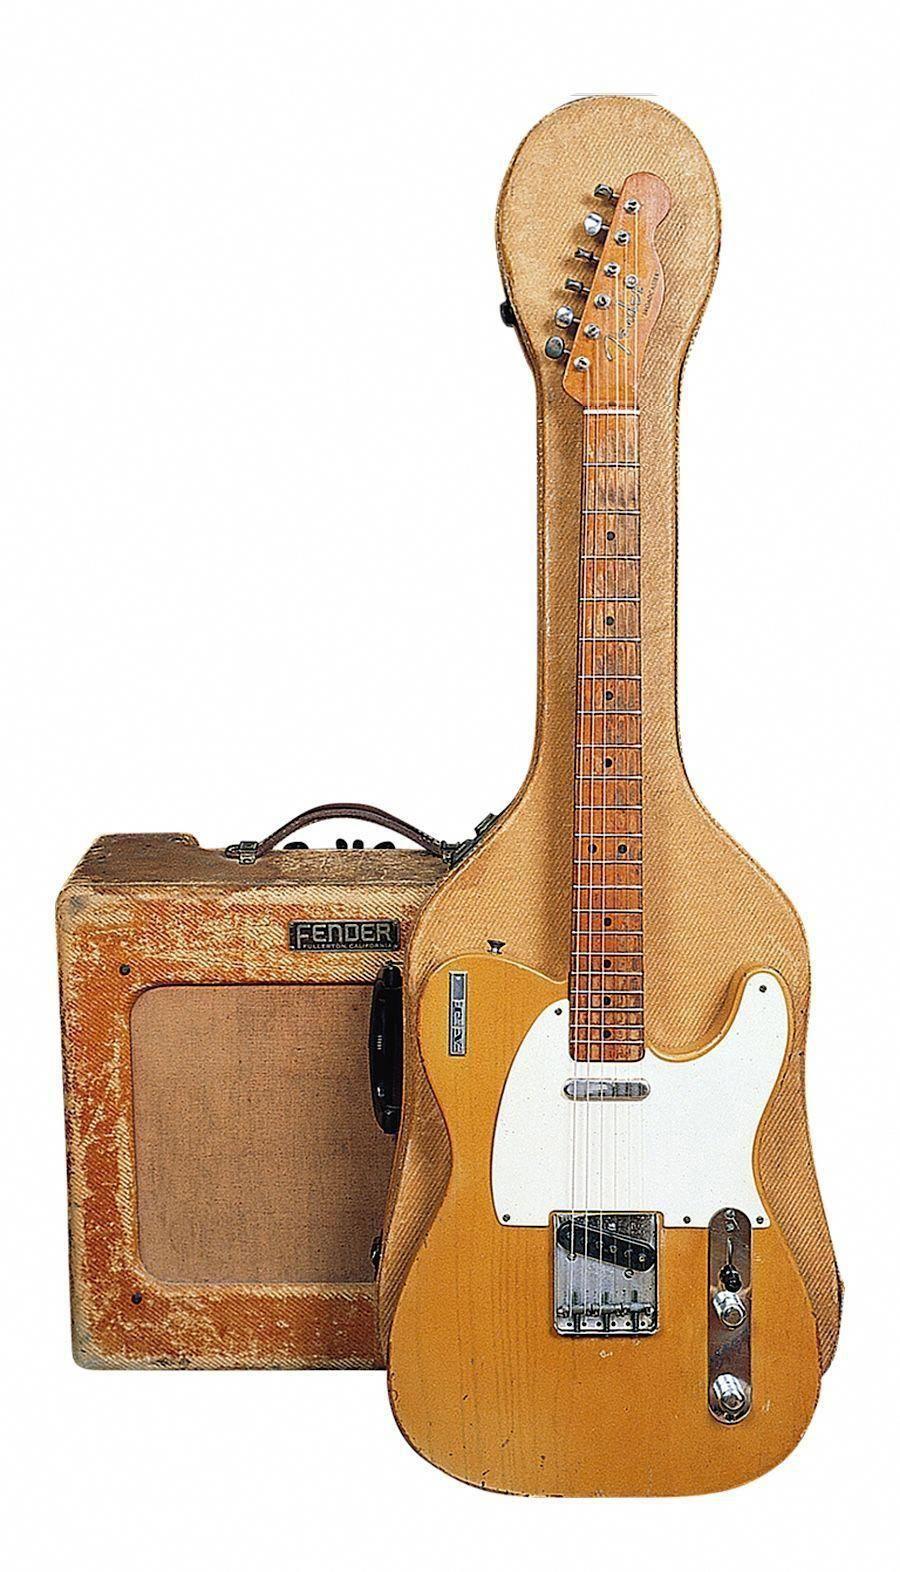 21 Unbelievable Cheap Electric Guitars Full Size Electric Guitar Gig Bag Fender Guitaristsofinstagram Guitare Cheap Electric Guitar Guitar Learn Bass Guitar